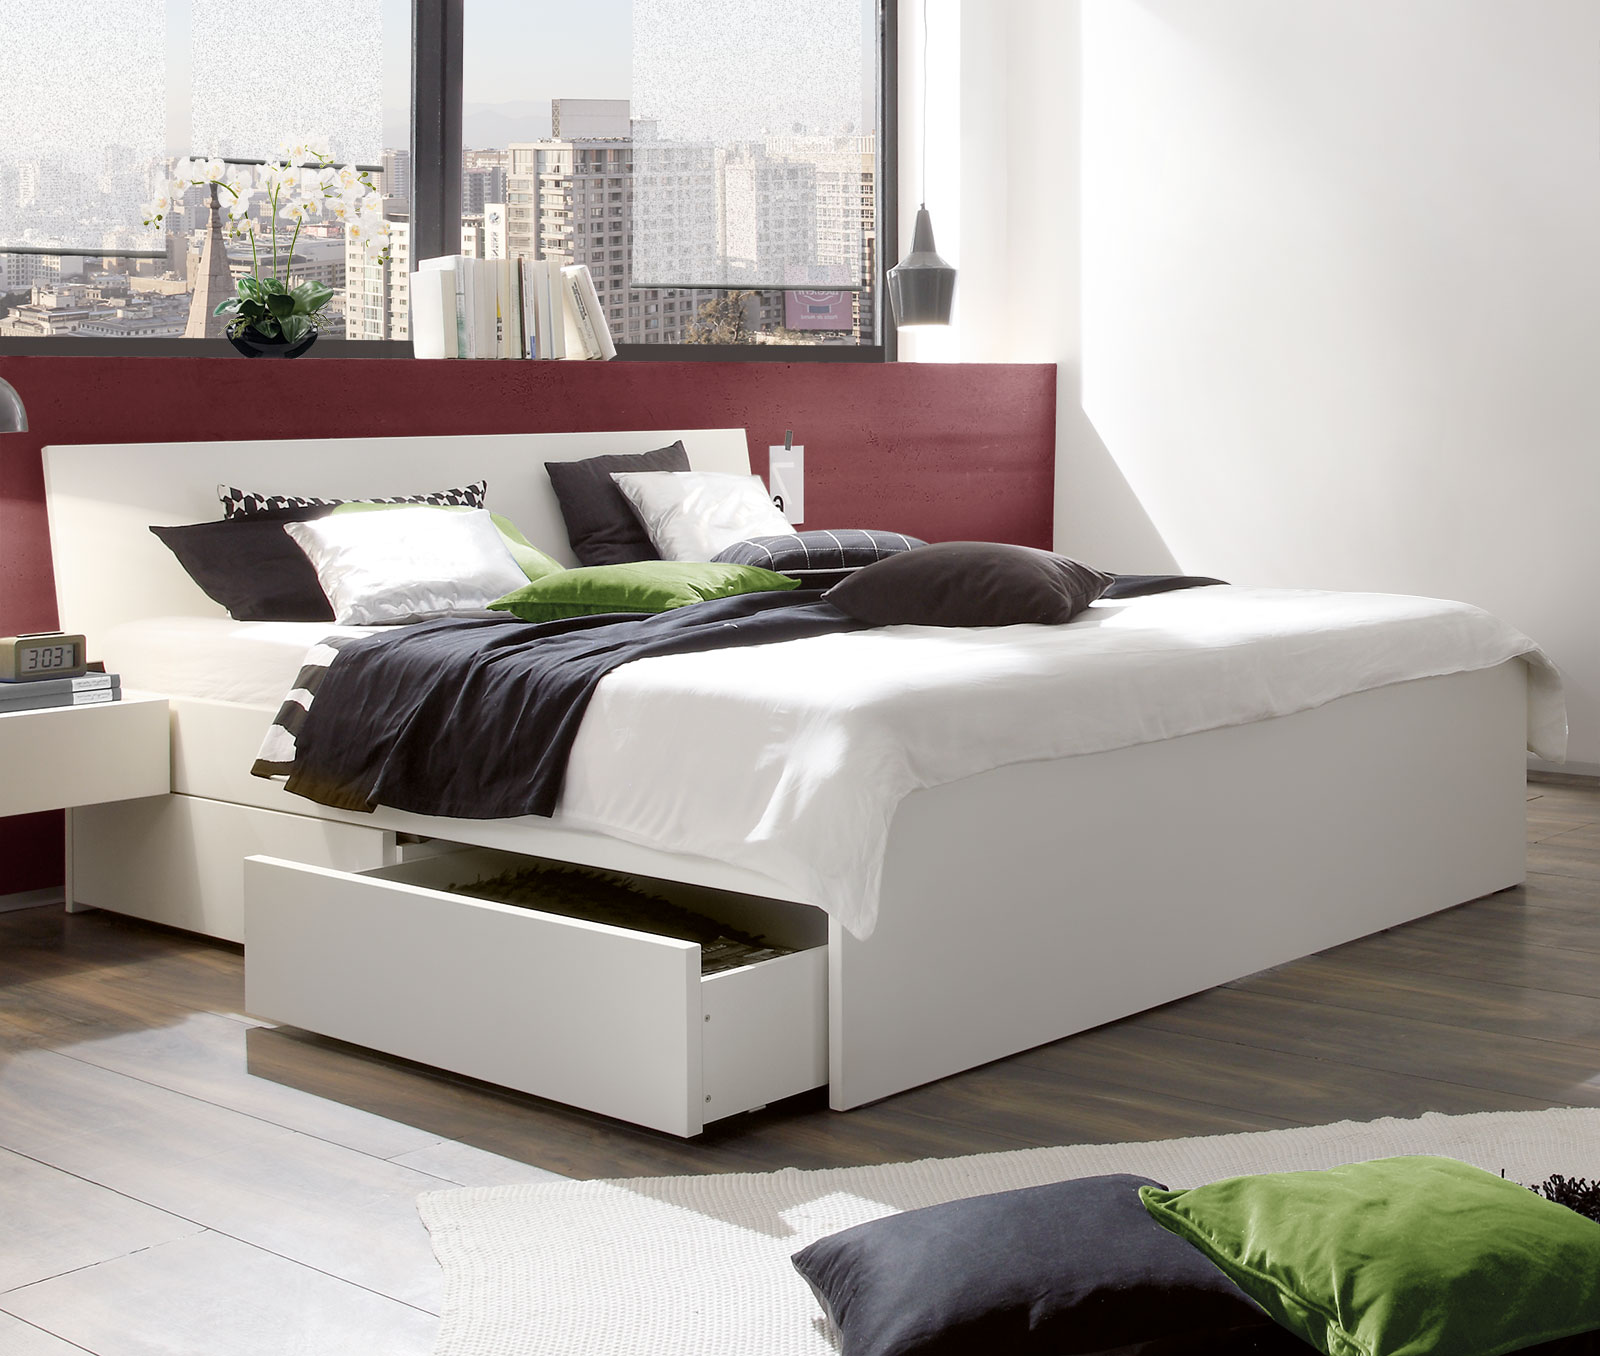 Full Size of Weies Schubkasten Bett In Bergren Erhltlich Liverpool Bett Betten.de